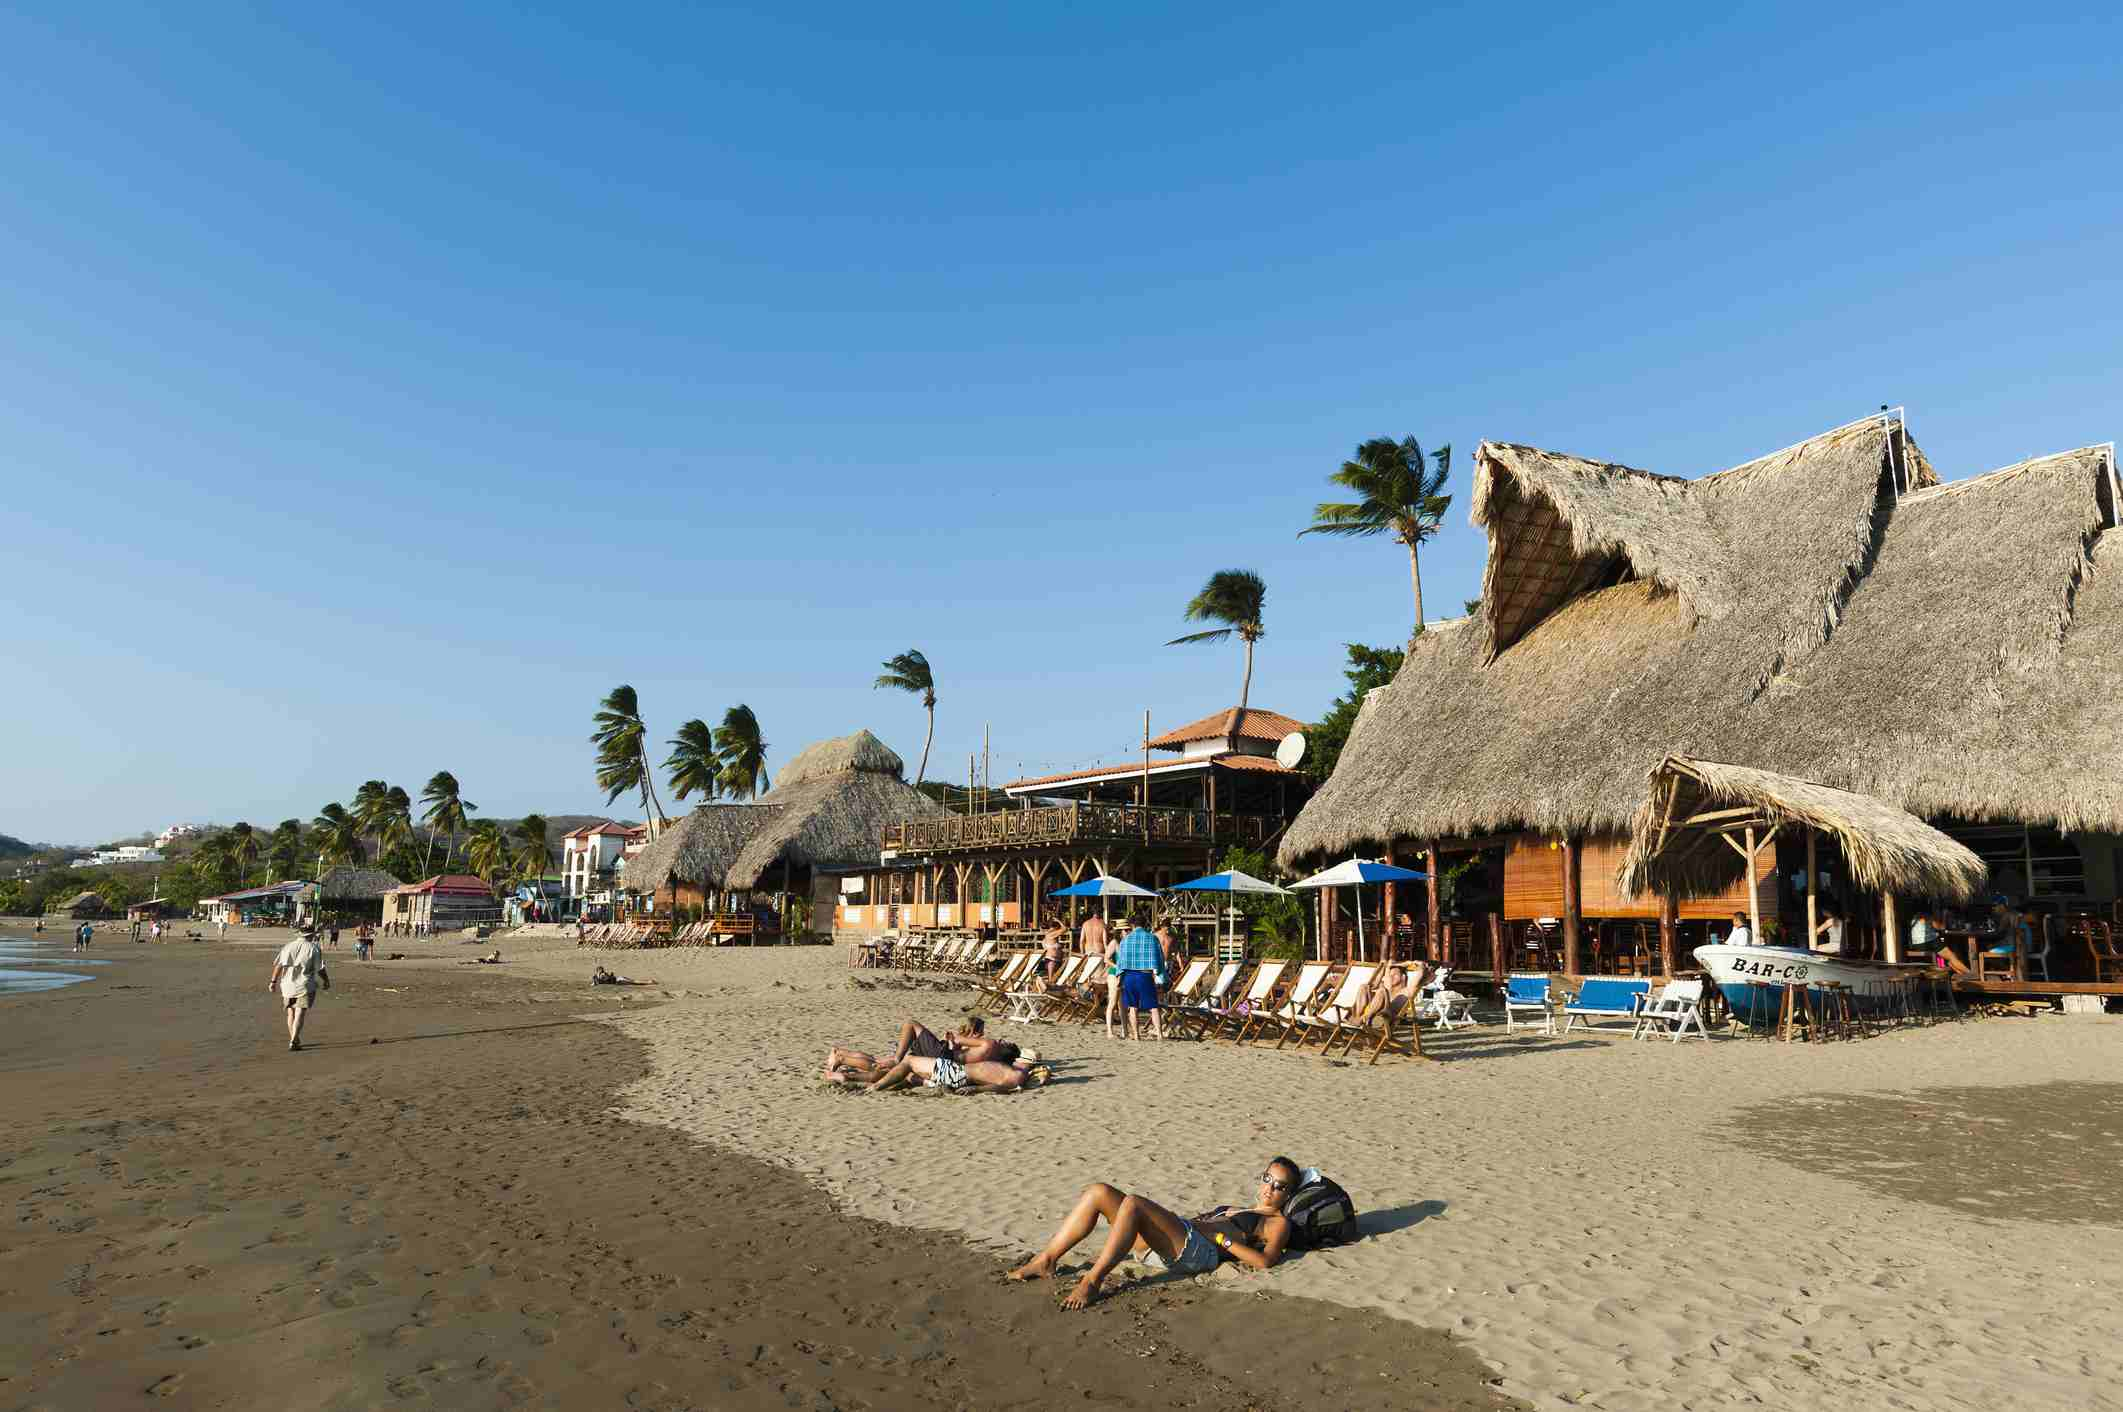 The beach of San Juan del Sur